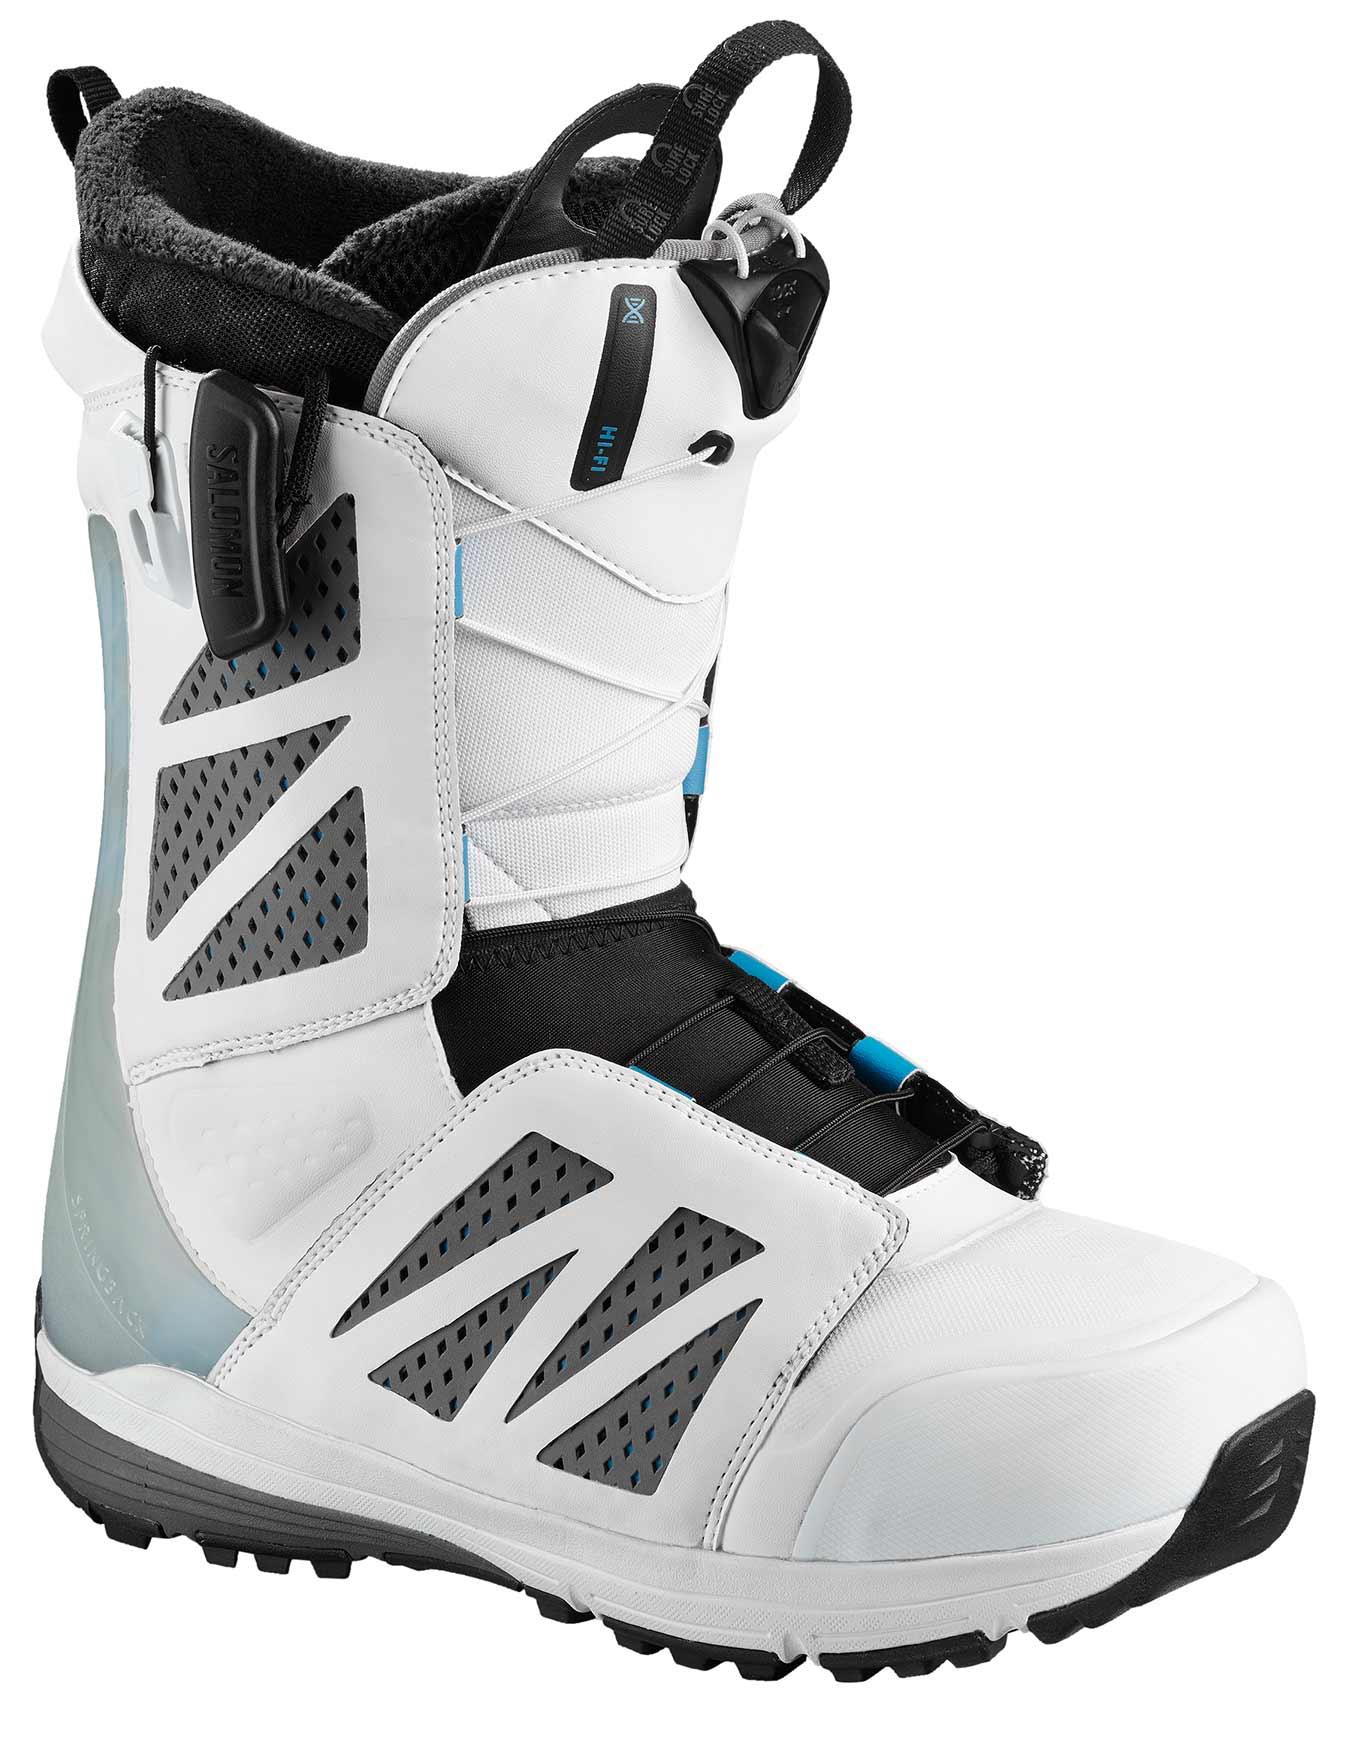 HI FI Chaussures Équipement de Snowboard Homme